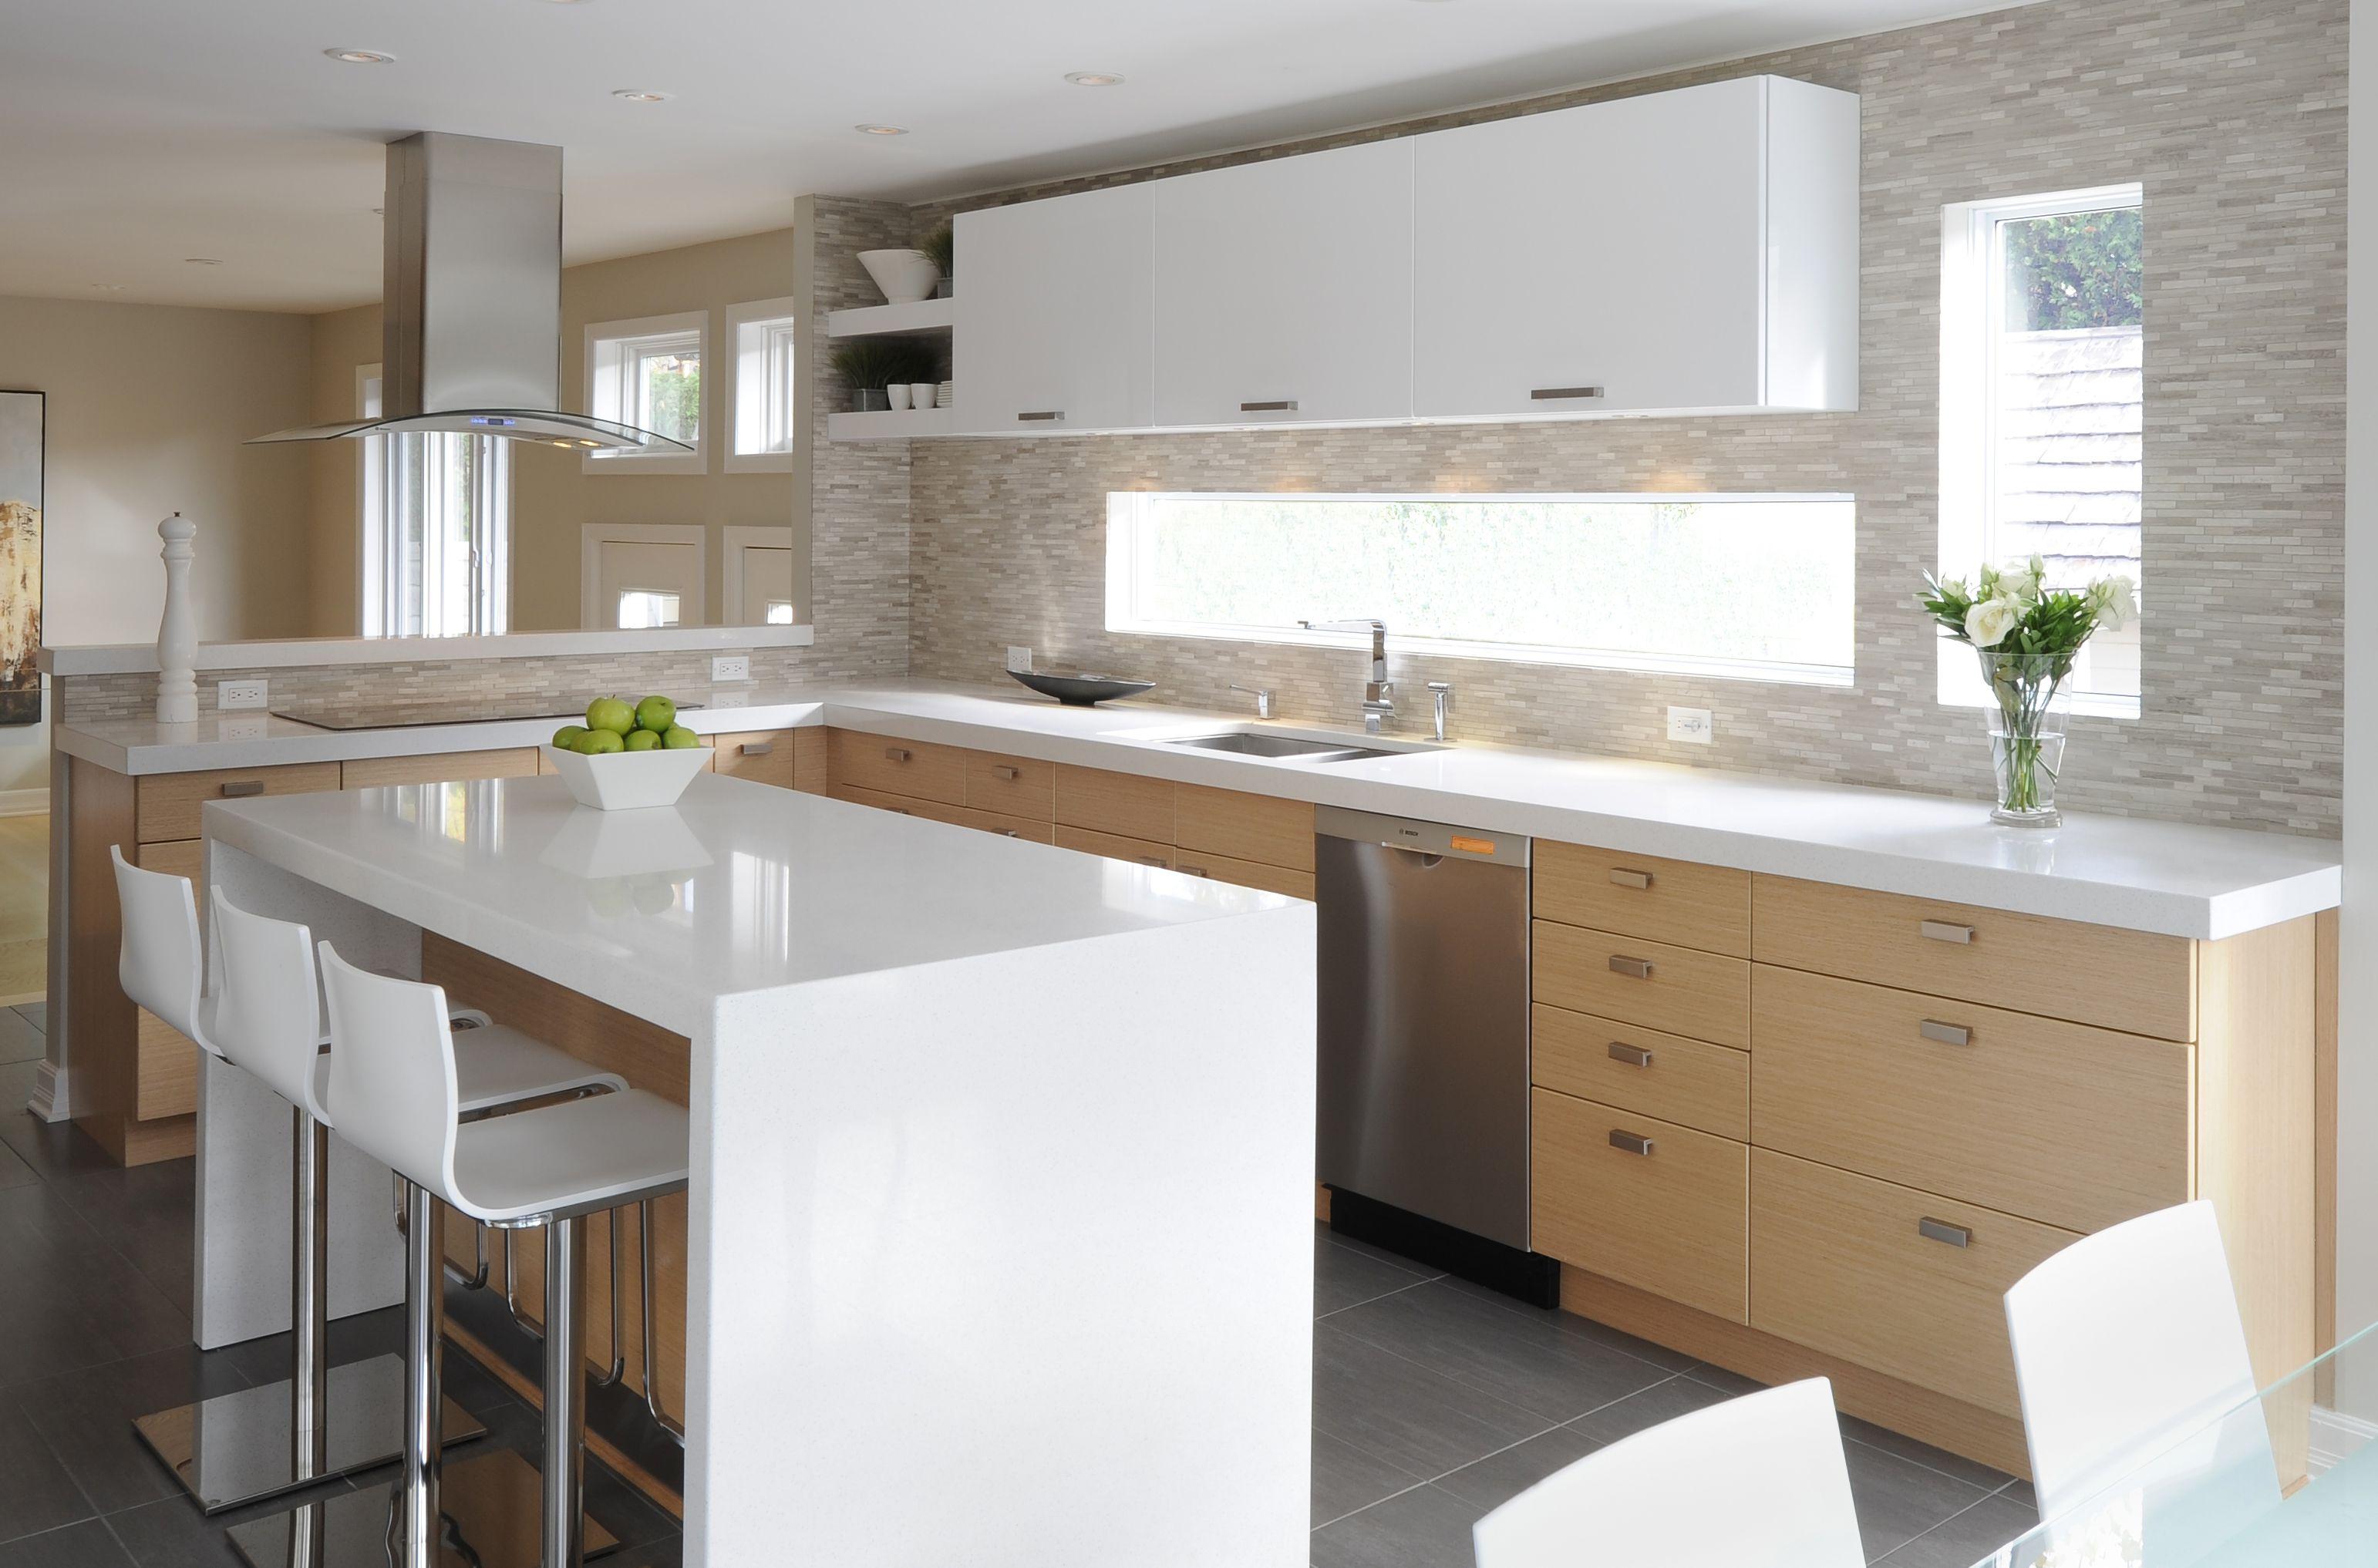 Modern European Style Kitchen Cabinets Kitchen Design White Oak Kitchen Oak Kitchen